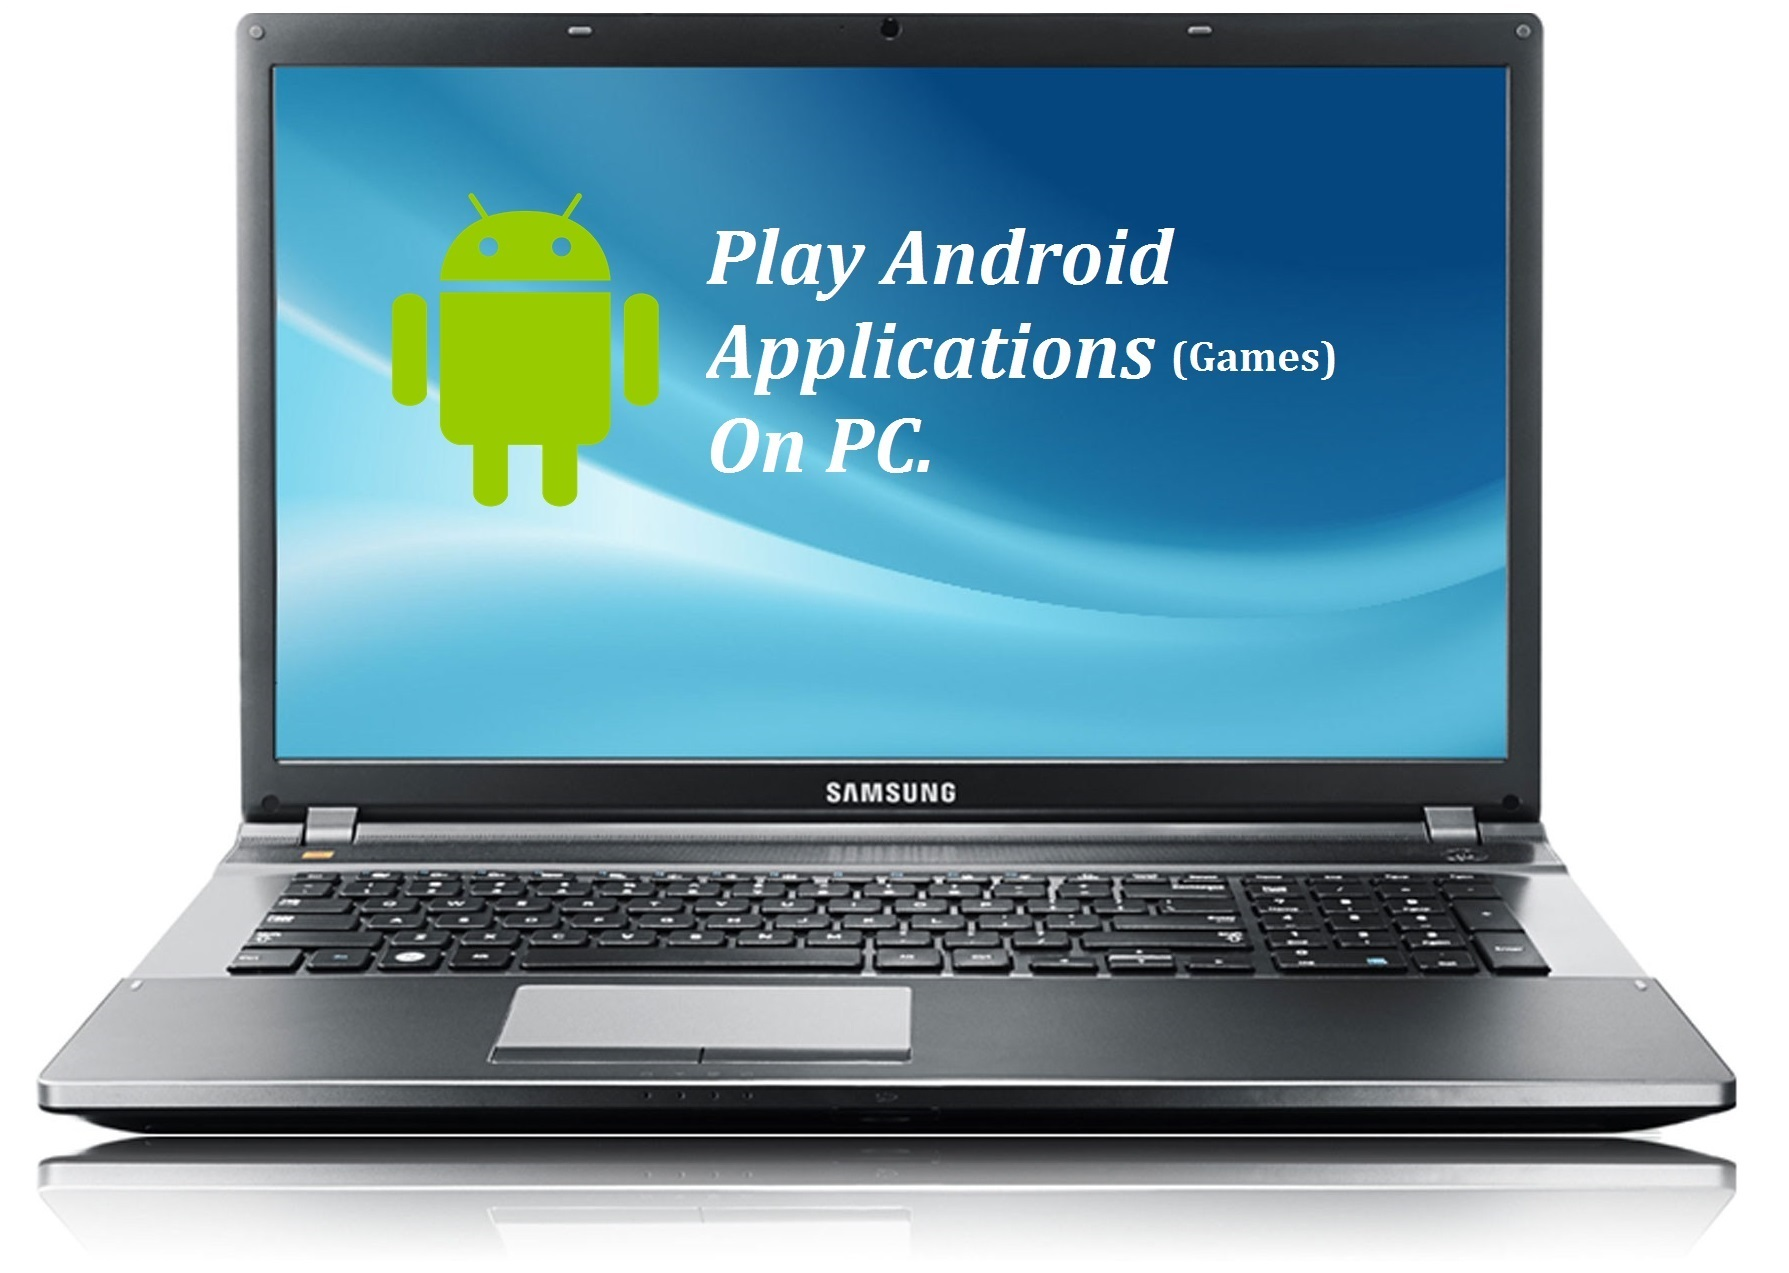 Notebook samsung games - Notebook Samsung Games 41